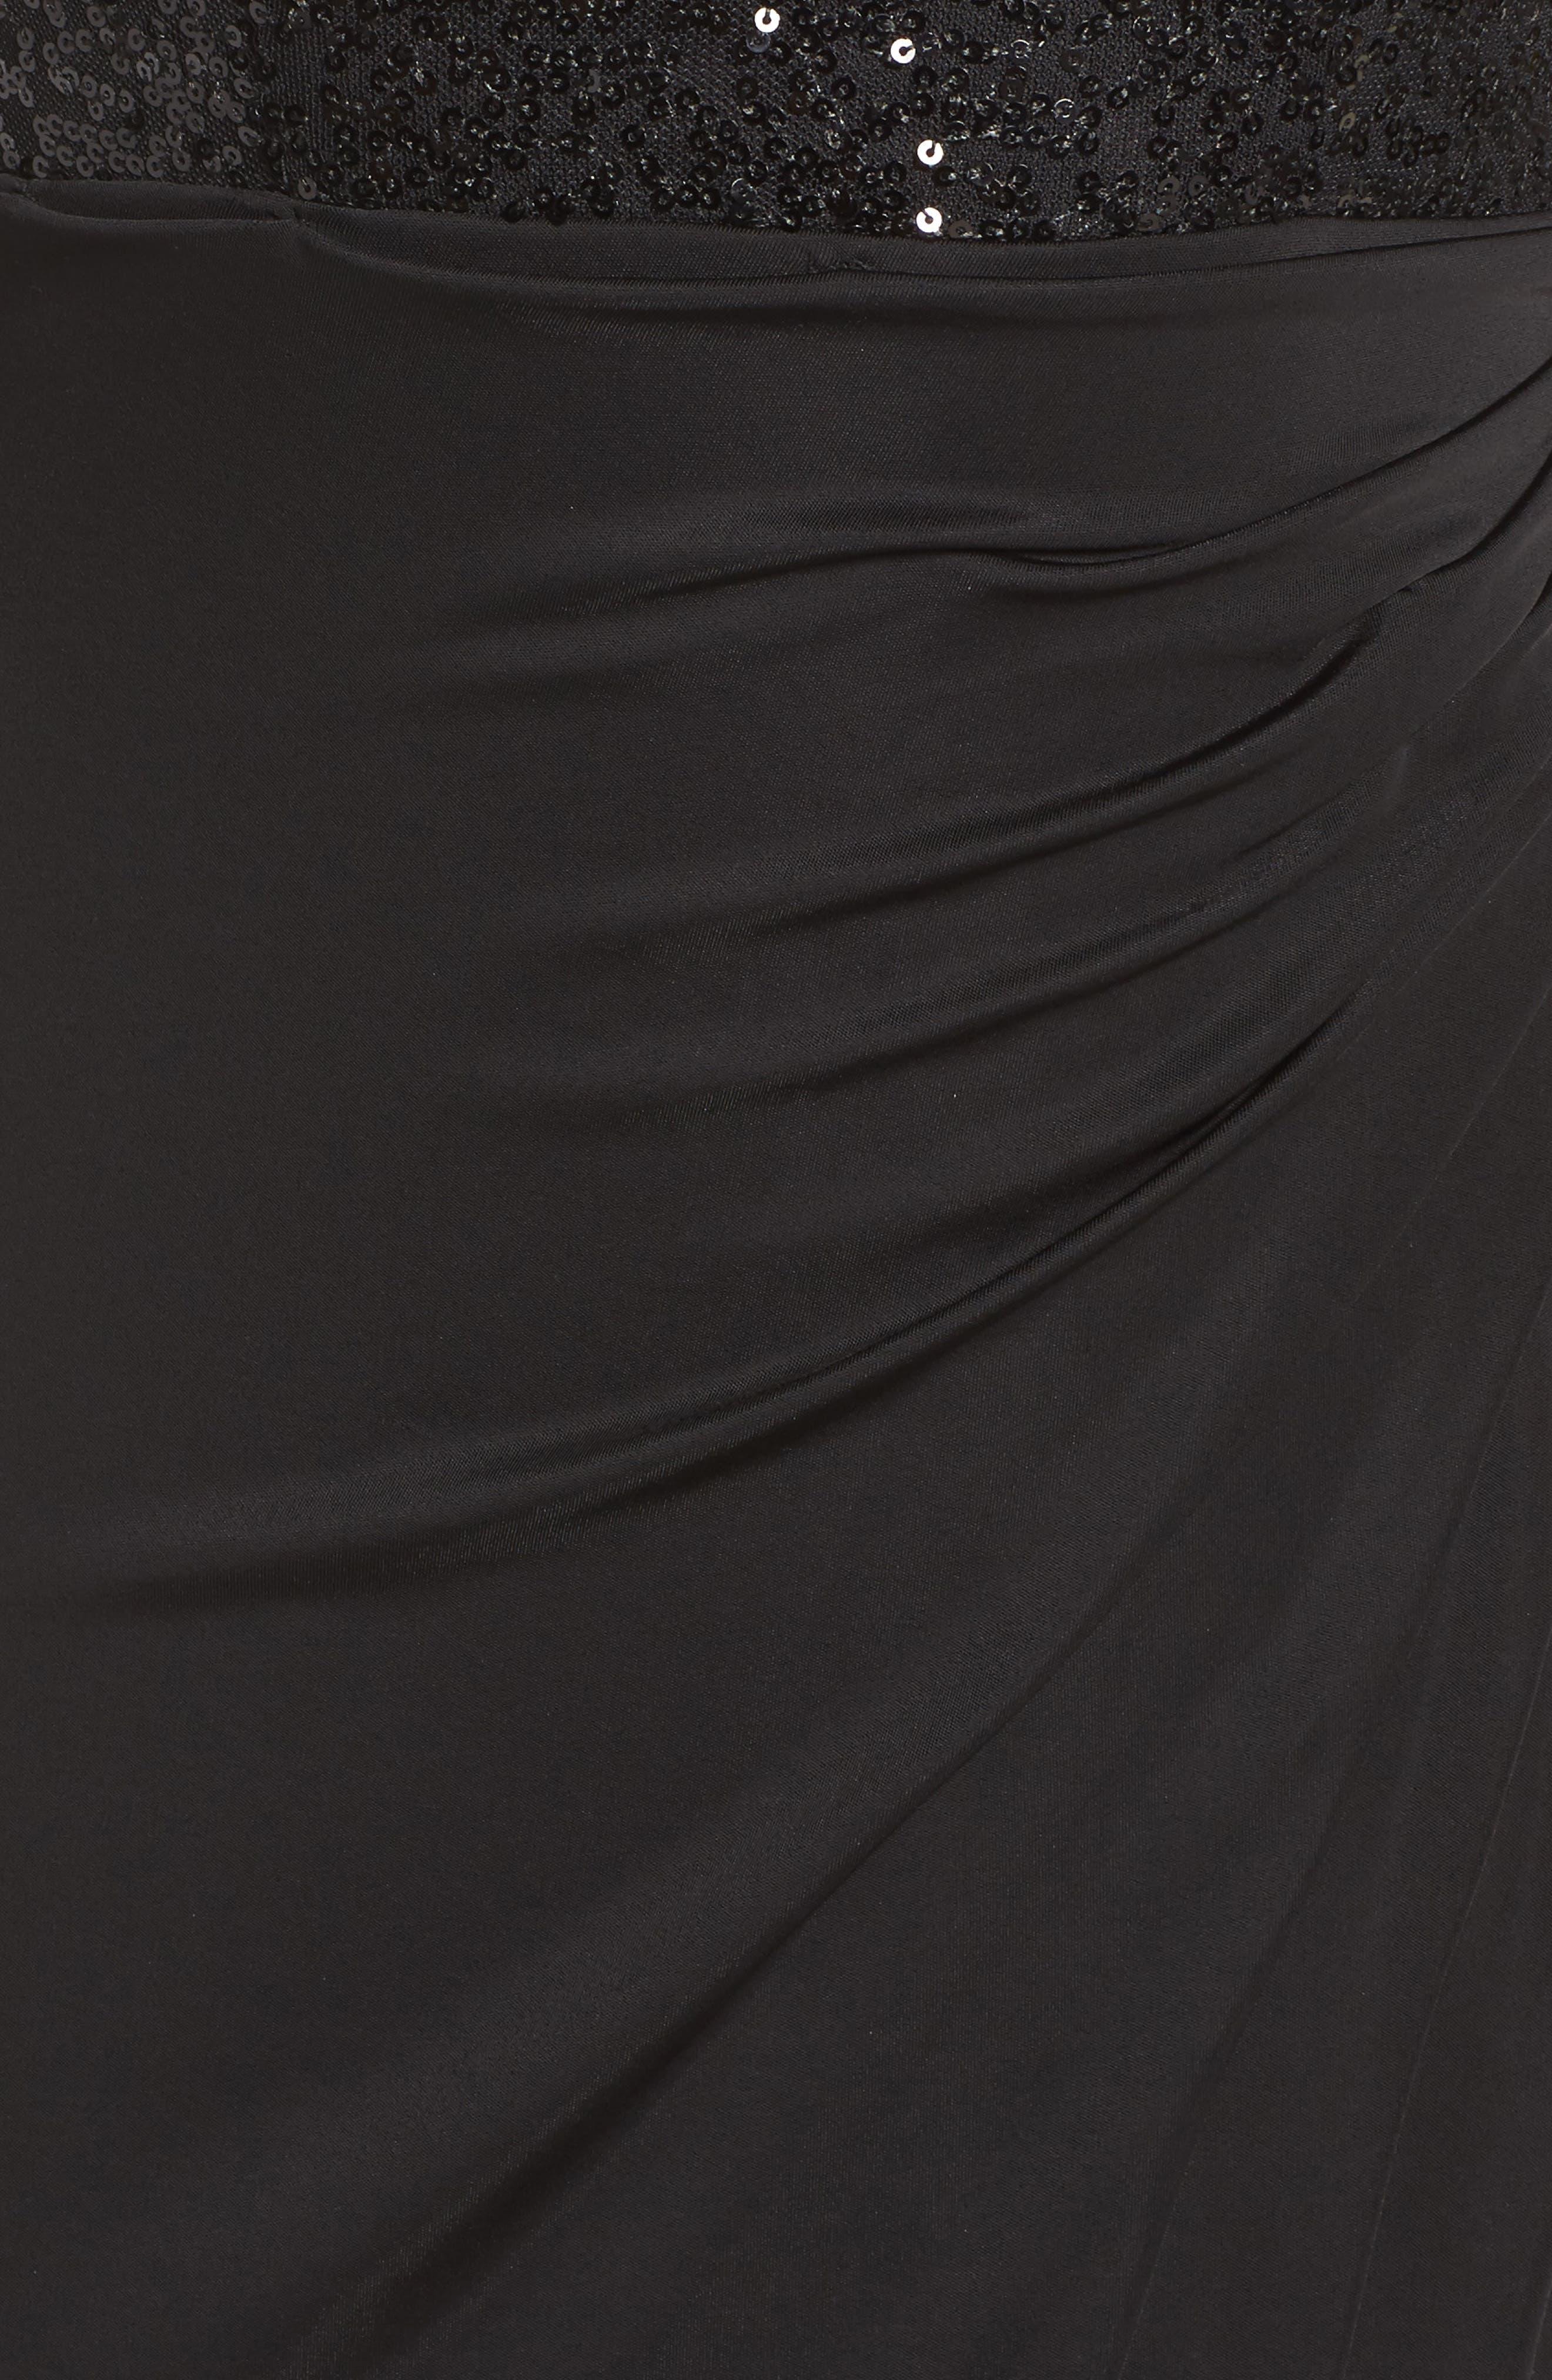 Sequin & Jersey Gown,                             Alternate thumbnail 5, color,                             Black